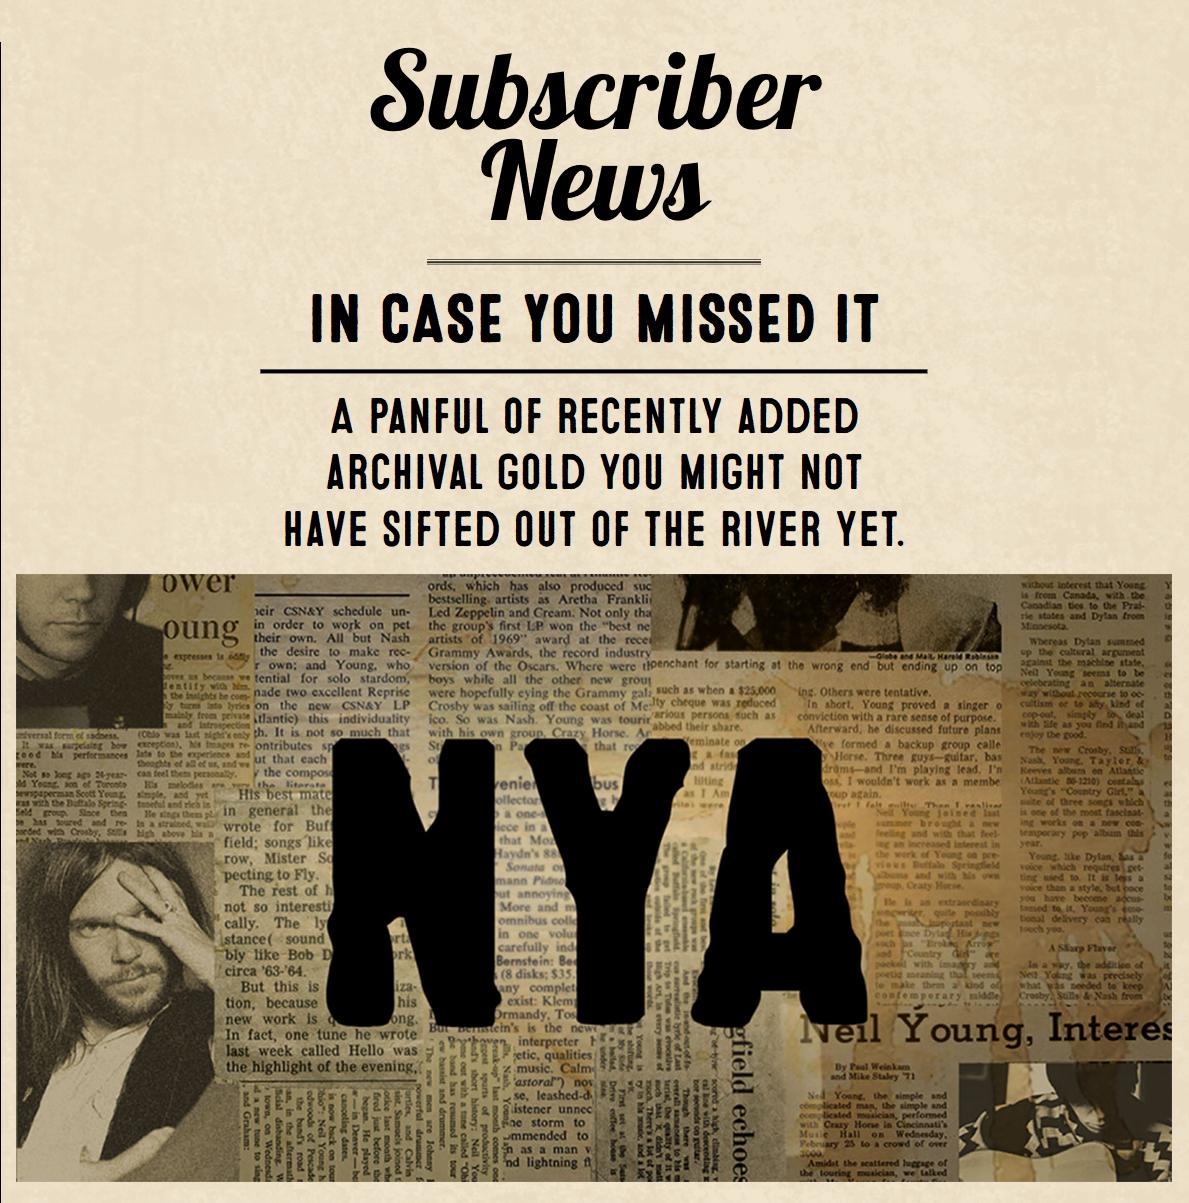 News-subscriber